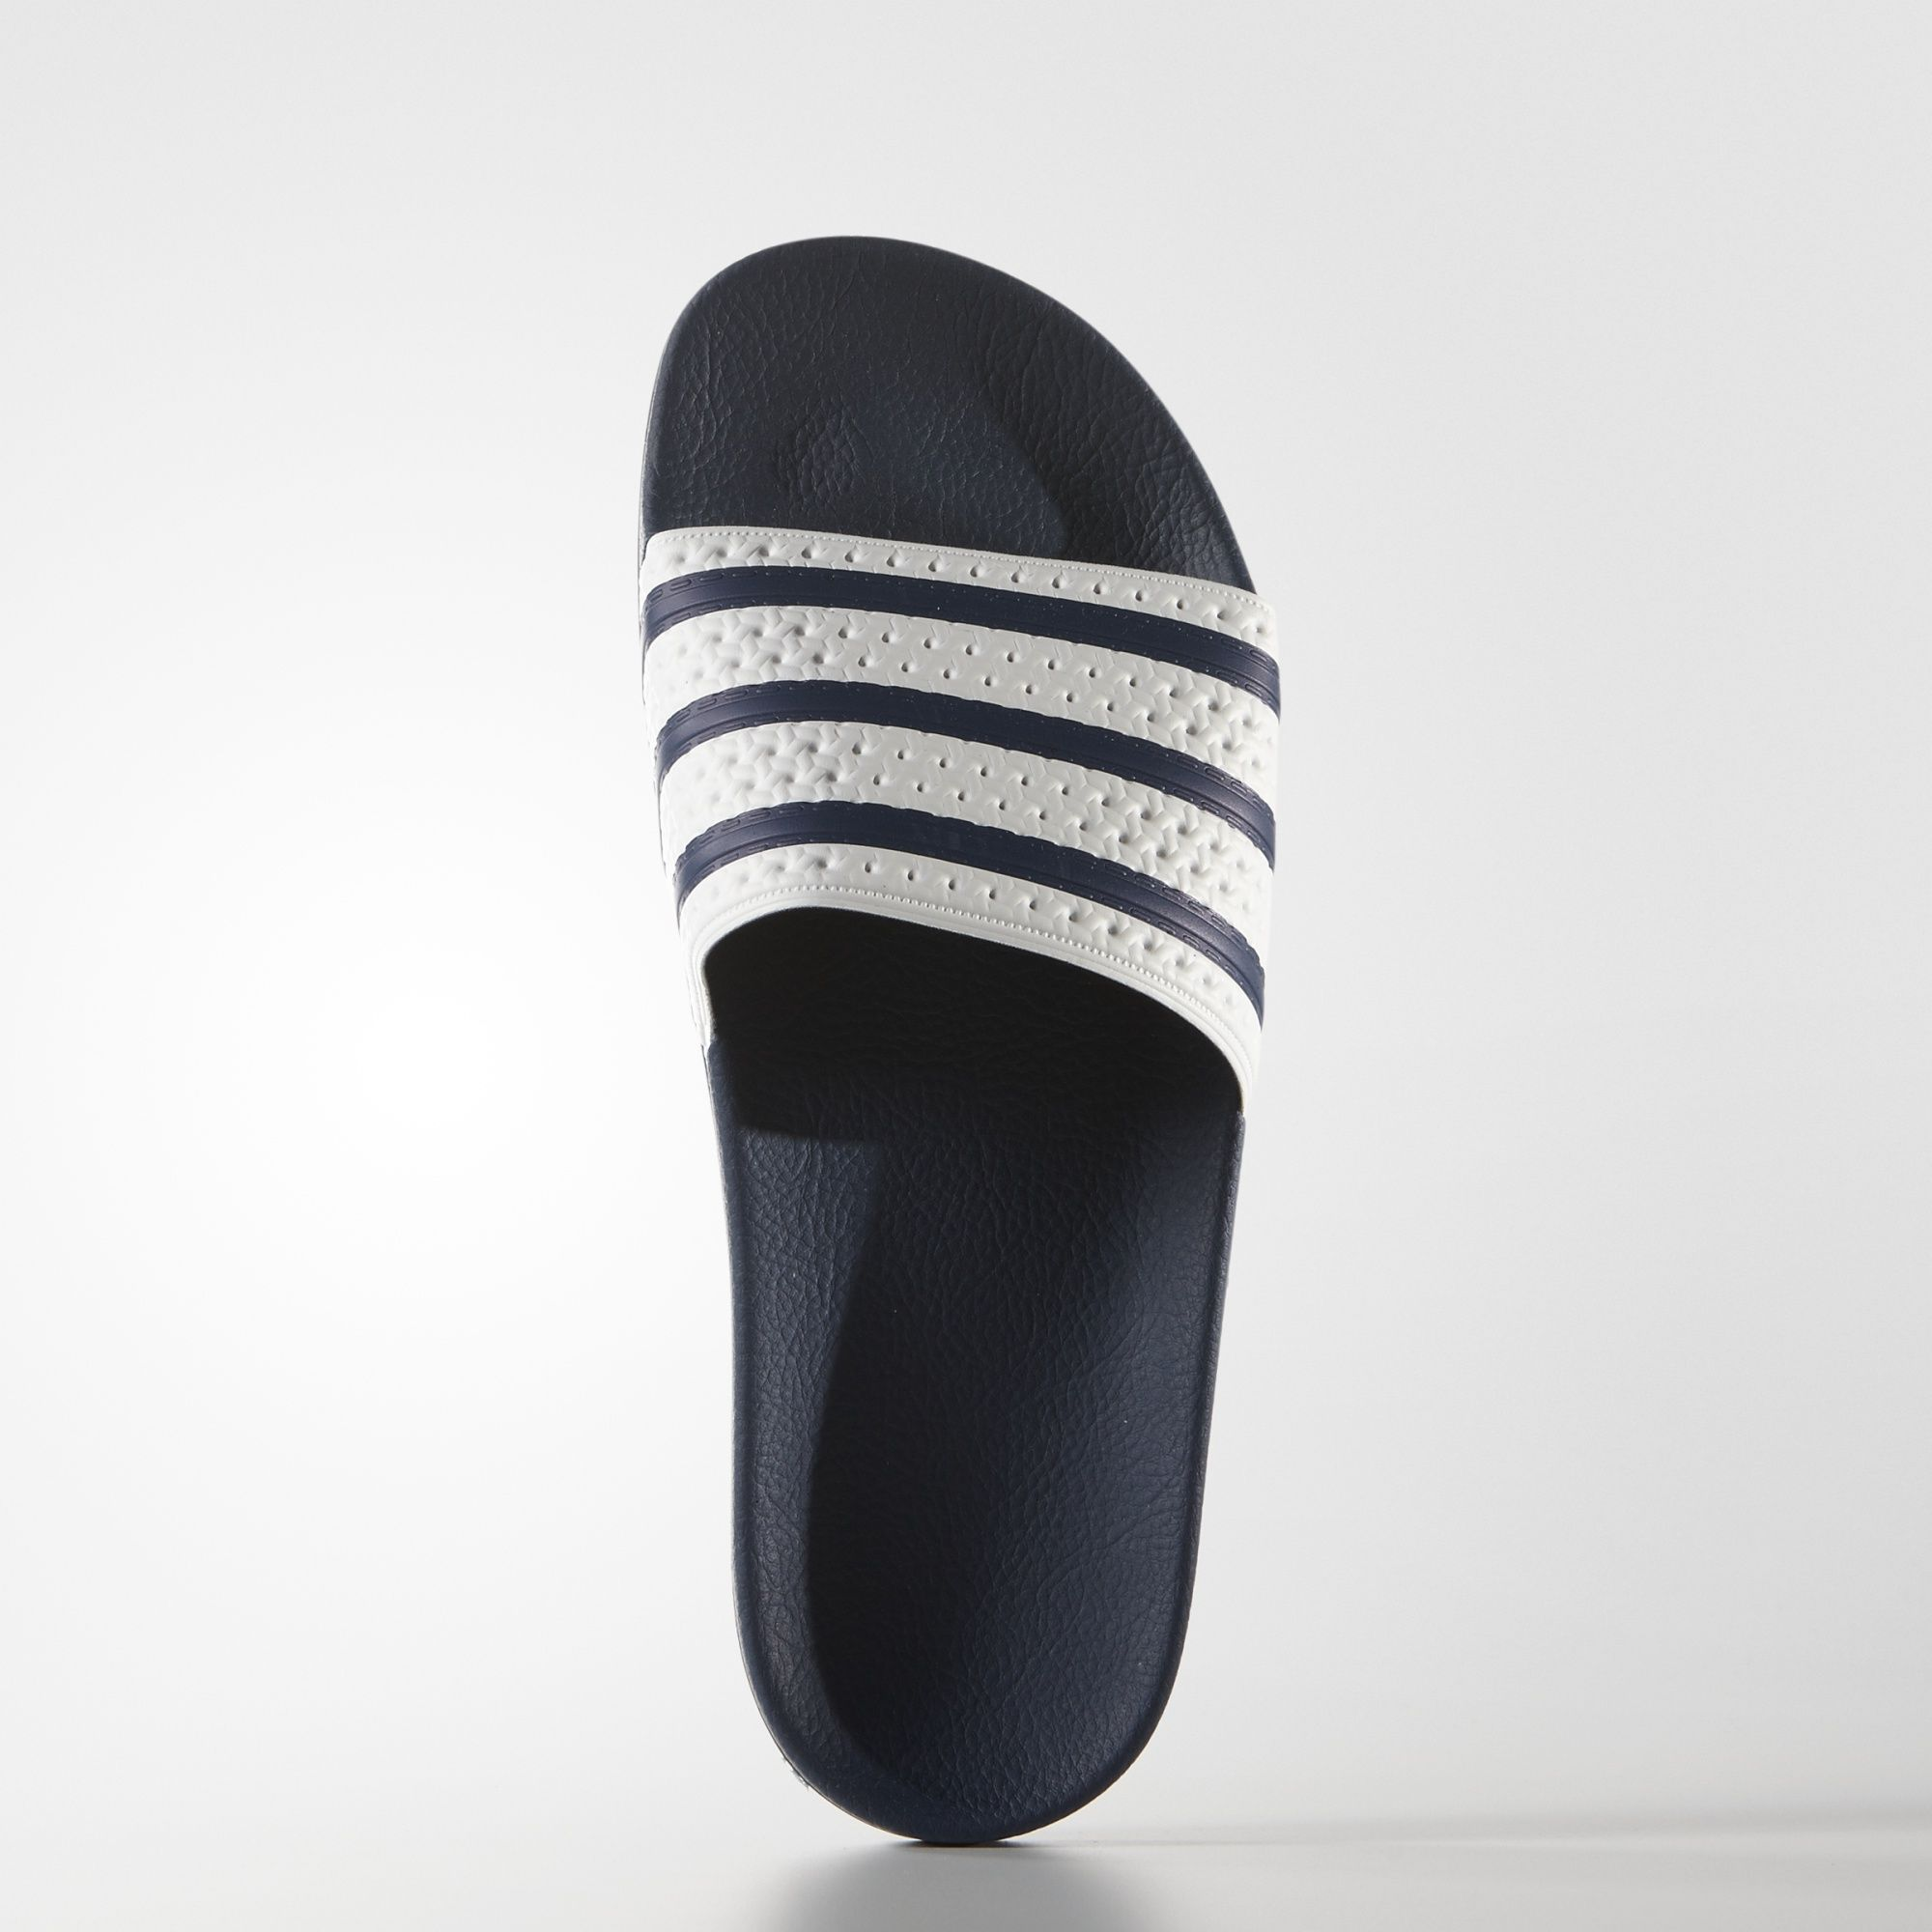 Adilette Slides | stuff | Adidas slides, Slide sandals, Sandals